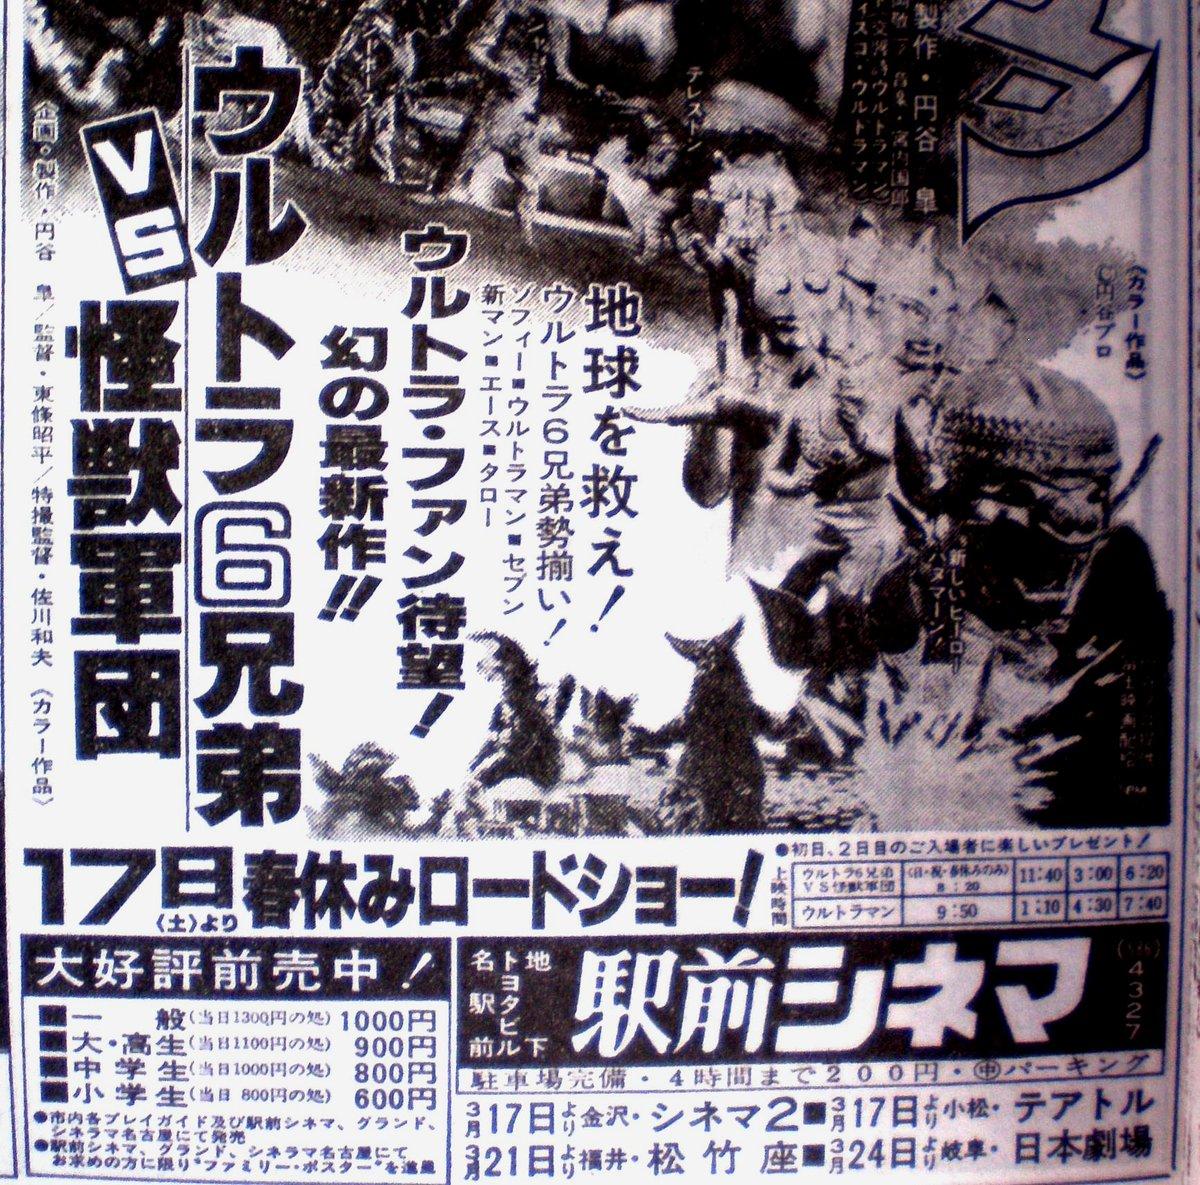 Hashtag #ウルトラ6兄弟vs怪獣軍団 auf Twitter